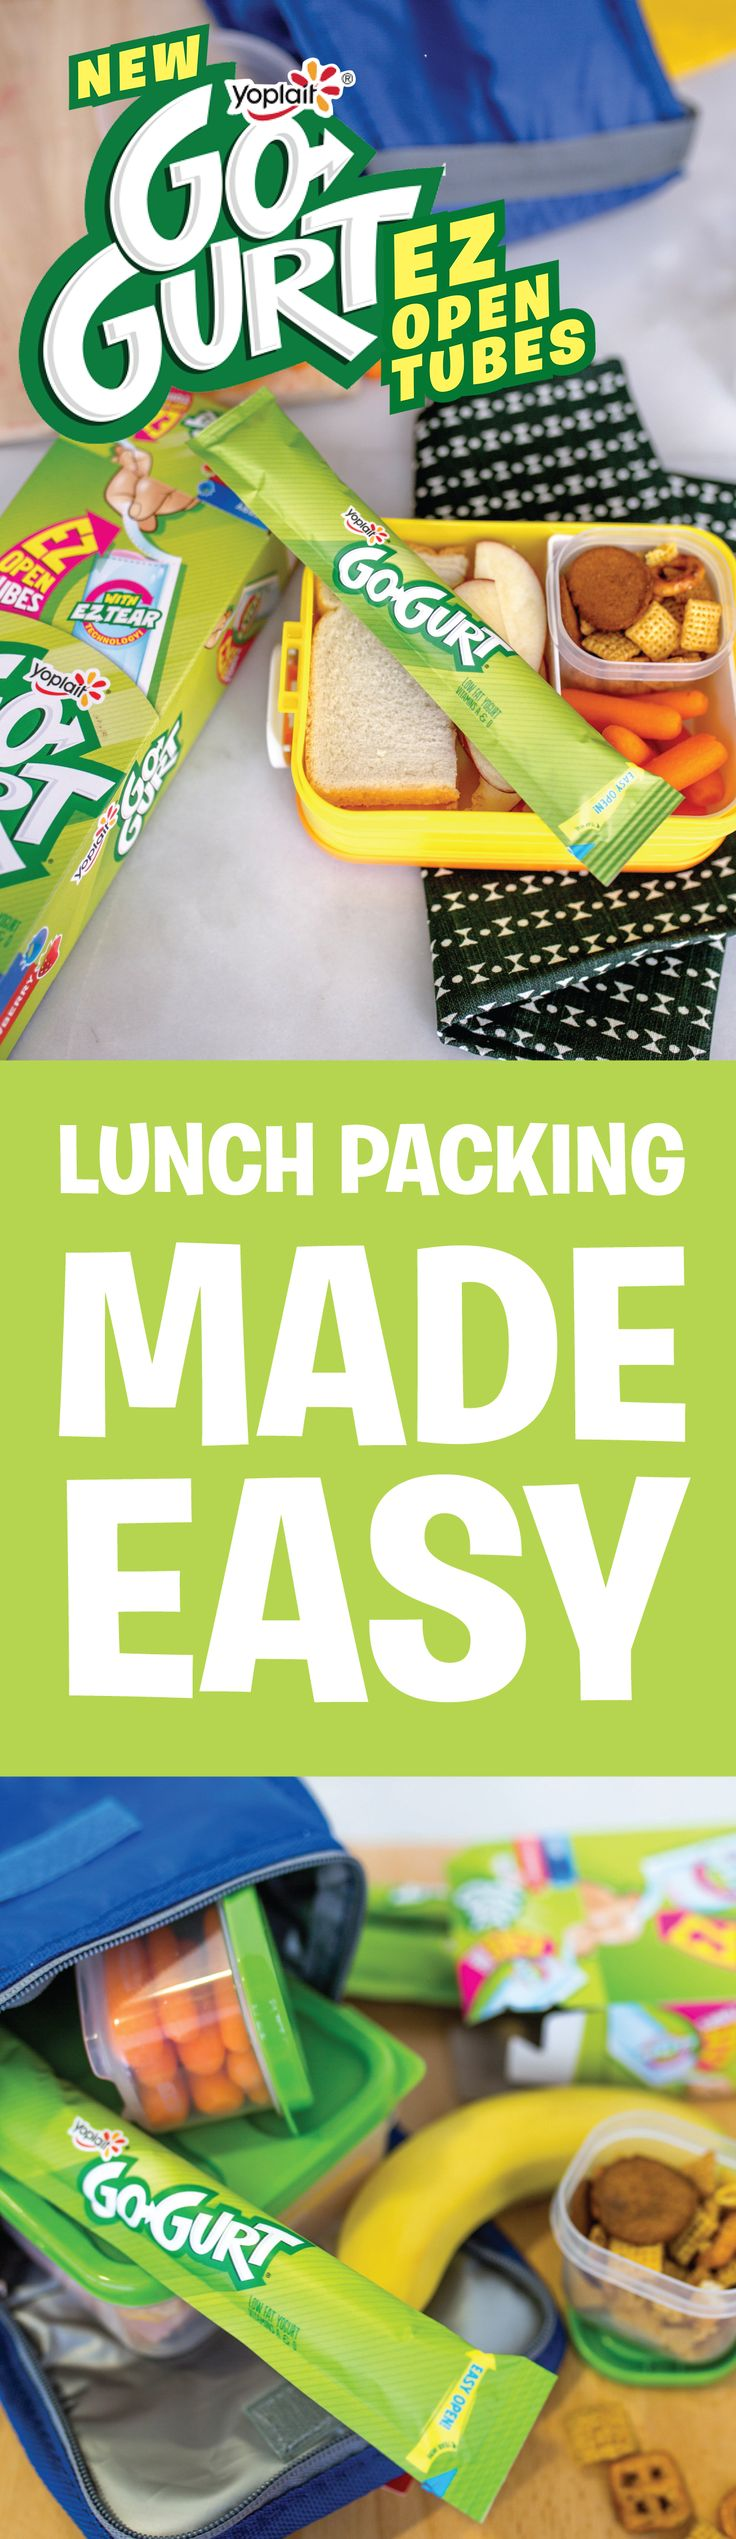 Go-GURT EZ Open Tubes = instant lunch box staple